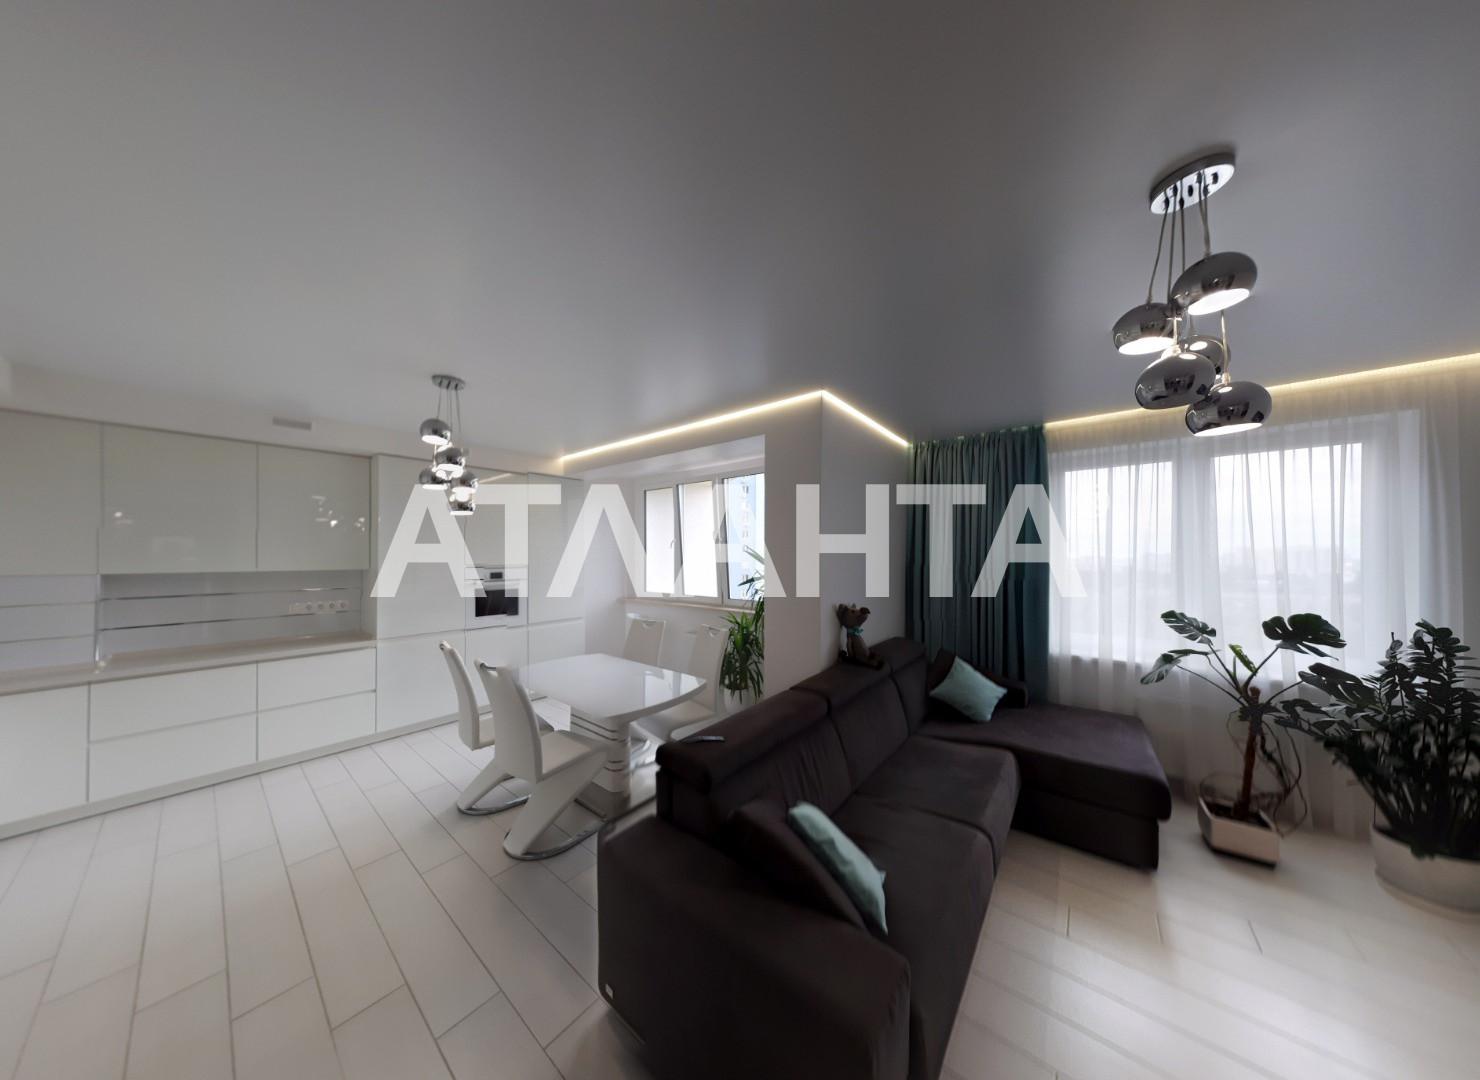 Продается 3-комнатная Квартира на ул. Просп. Глушкова — 160 000 у.е. (фото №28)